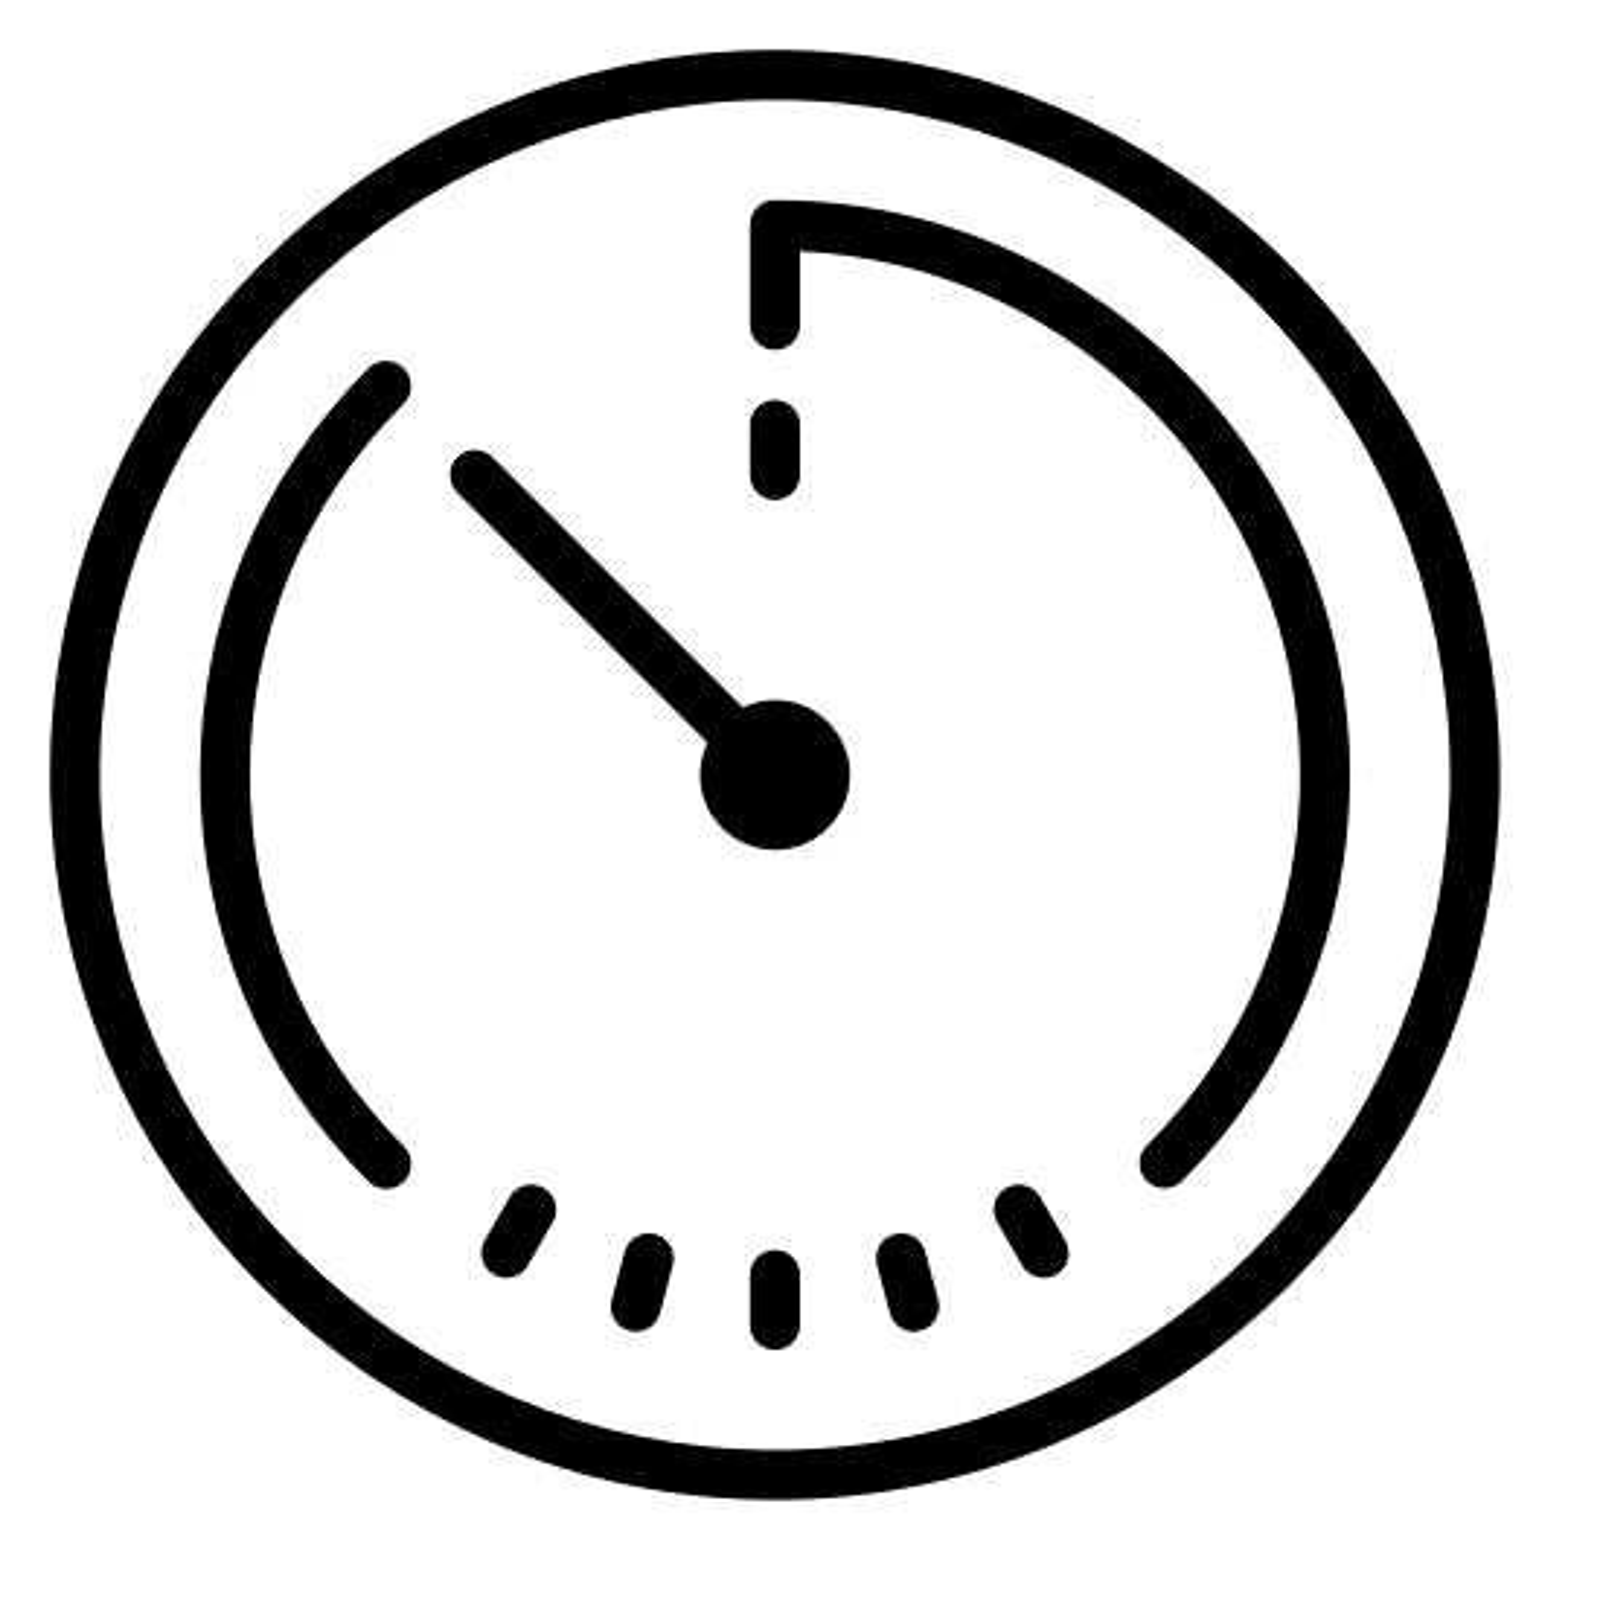 Stoper icon